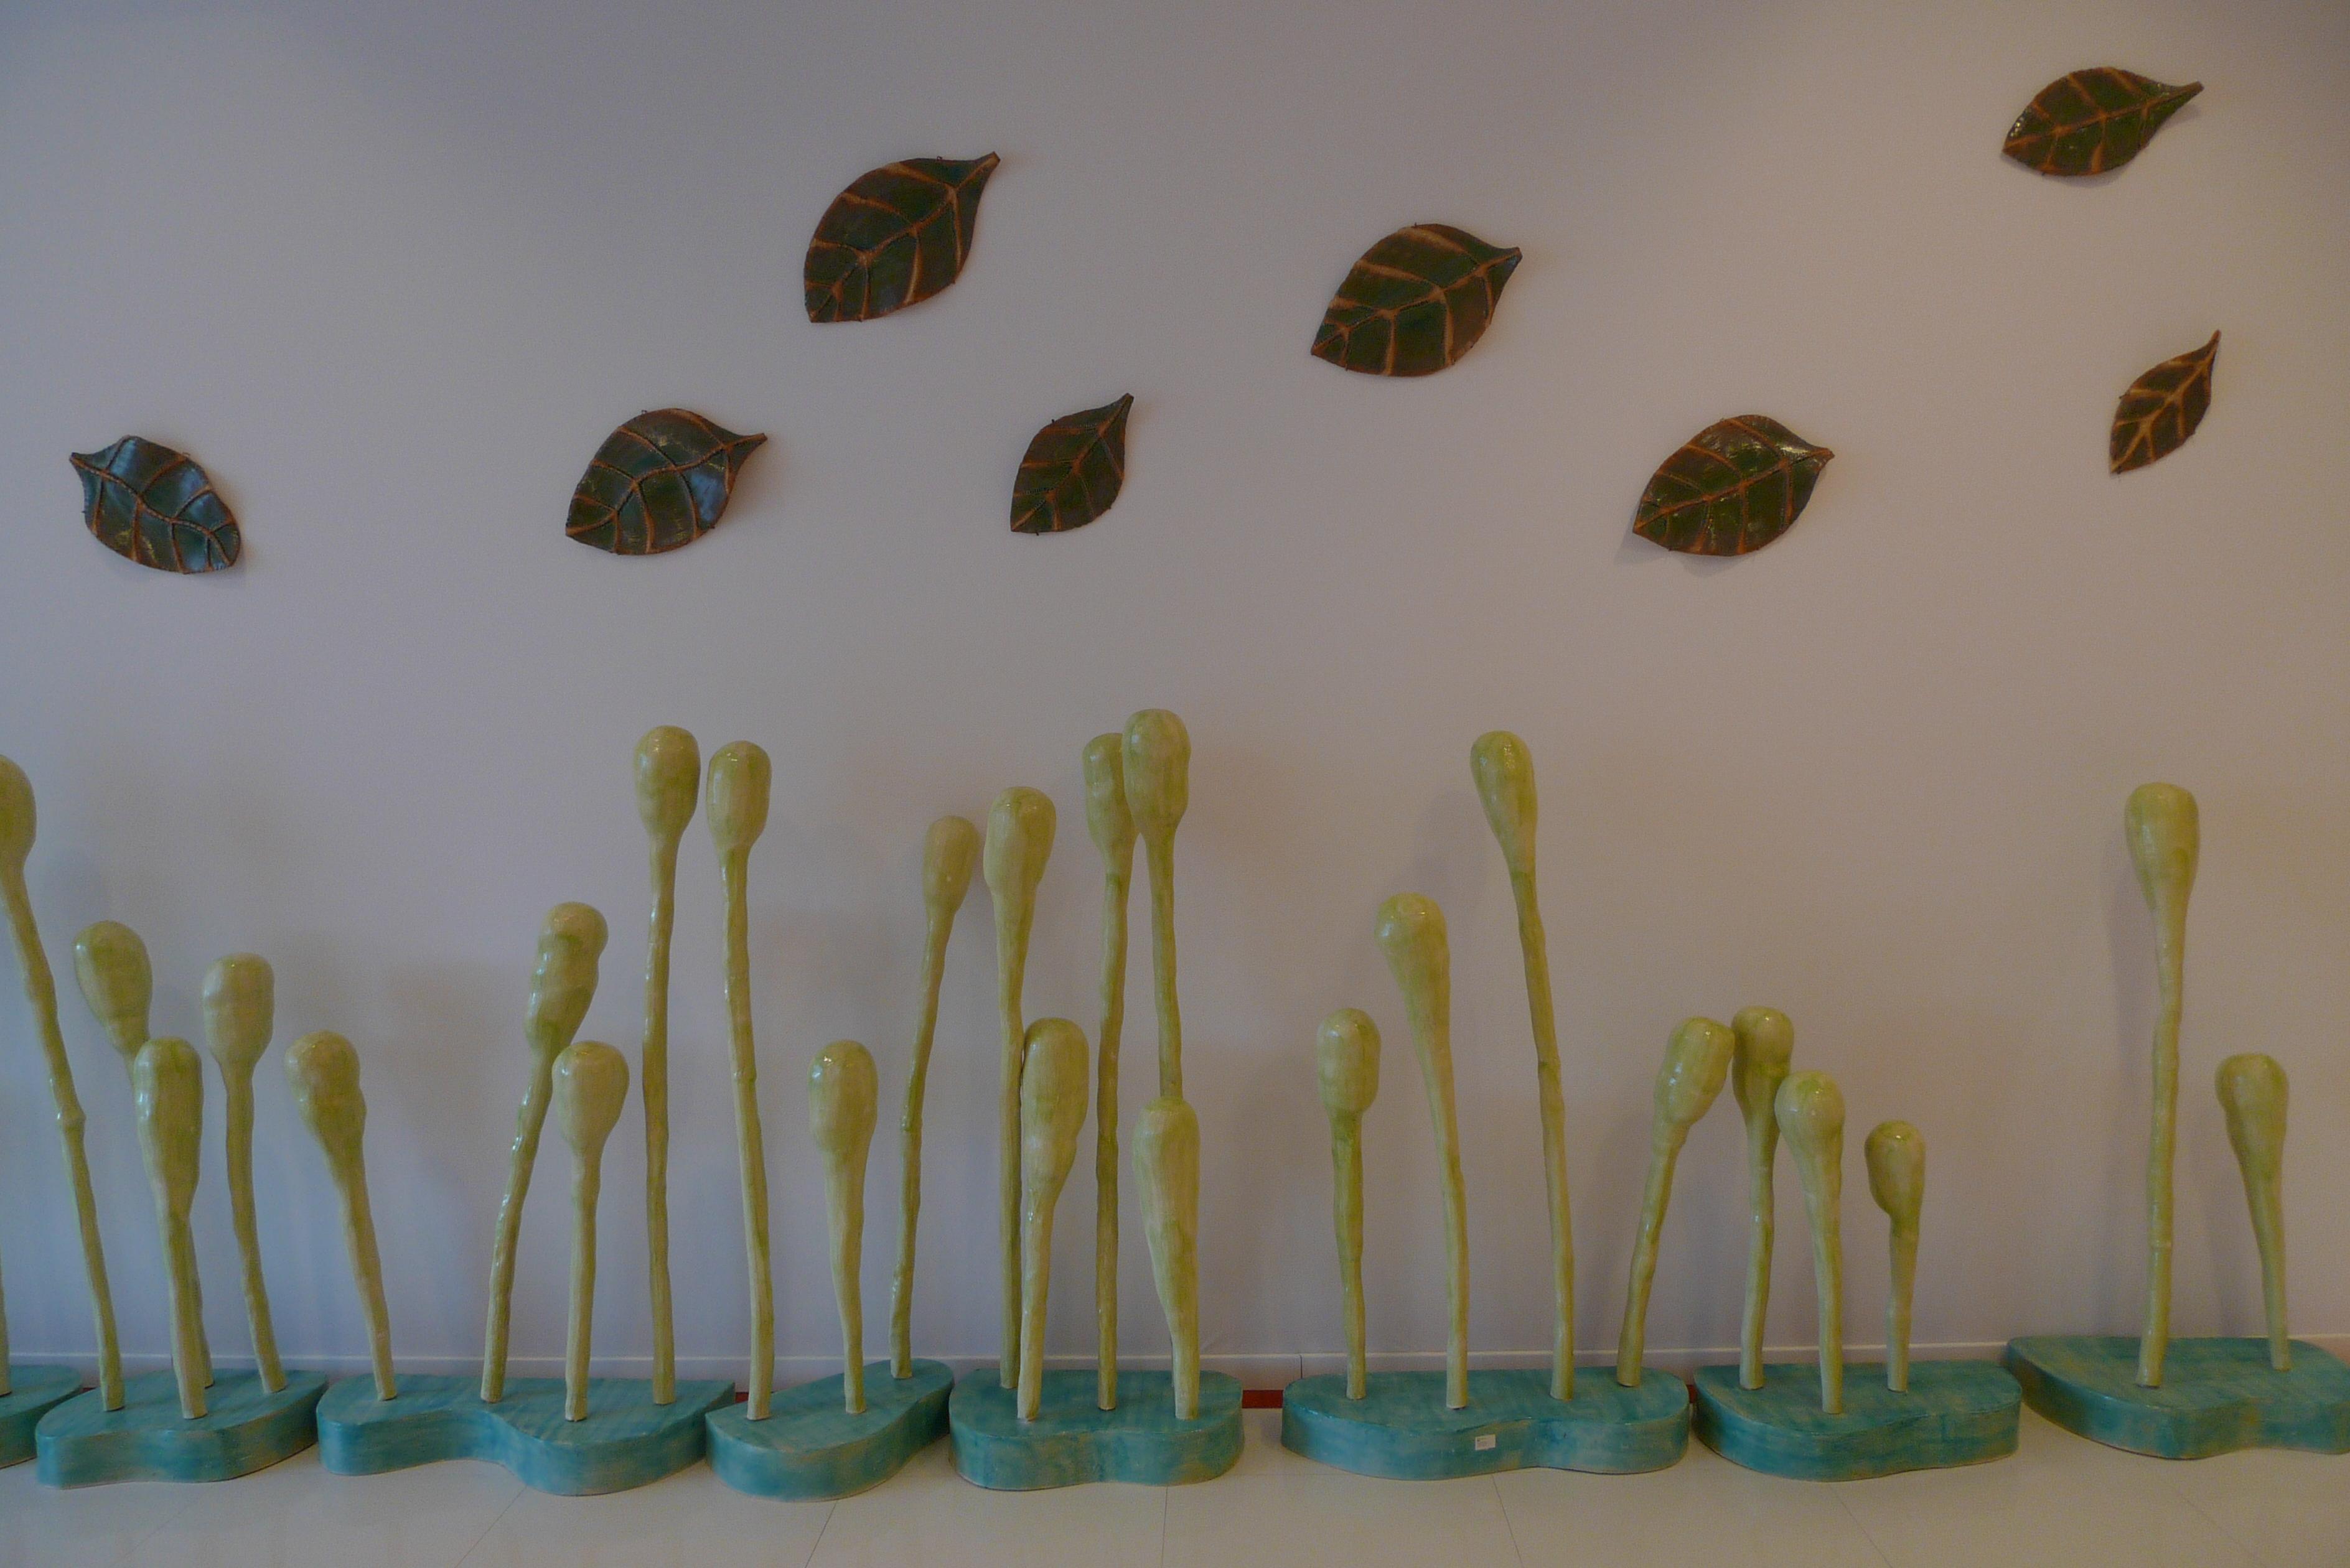 Reedscape